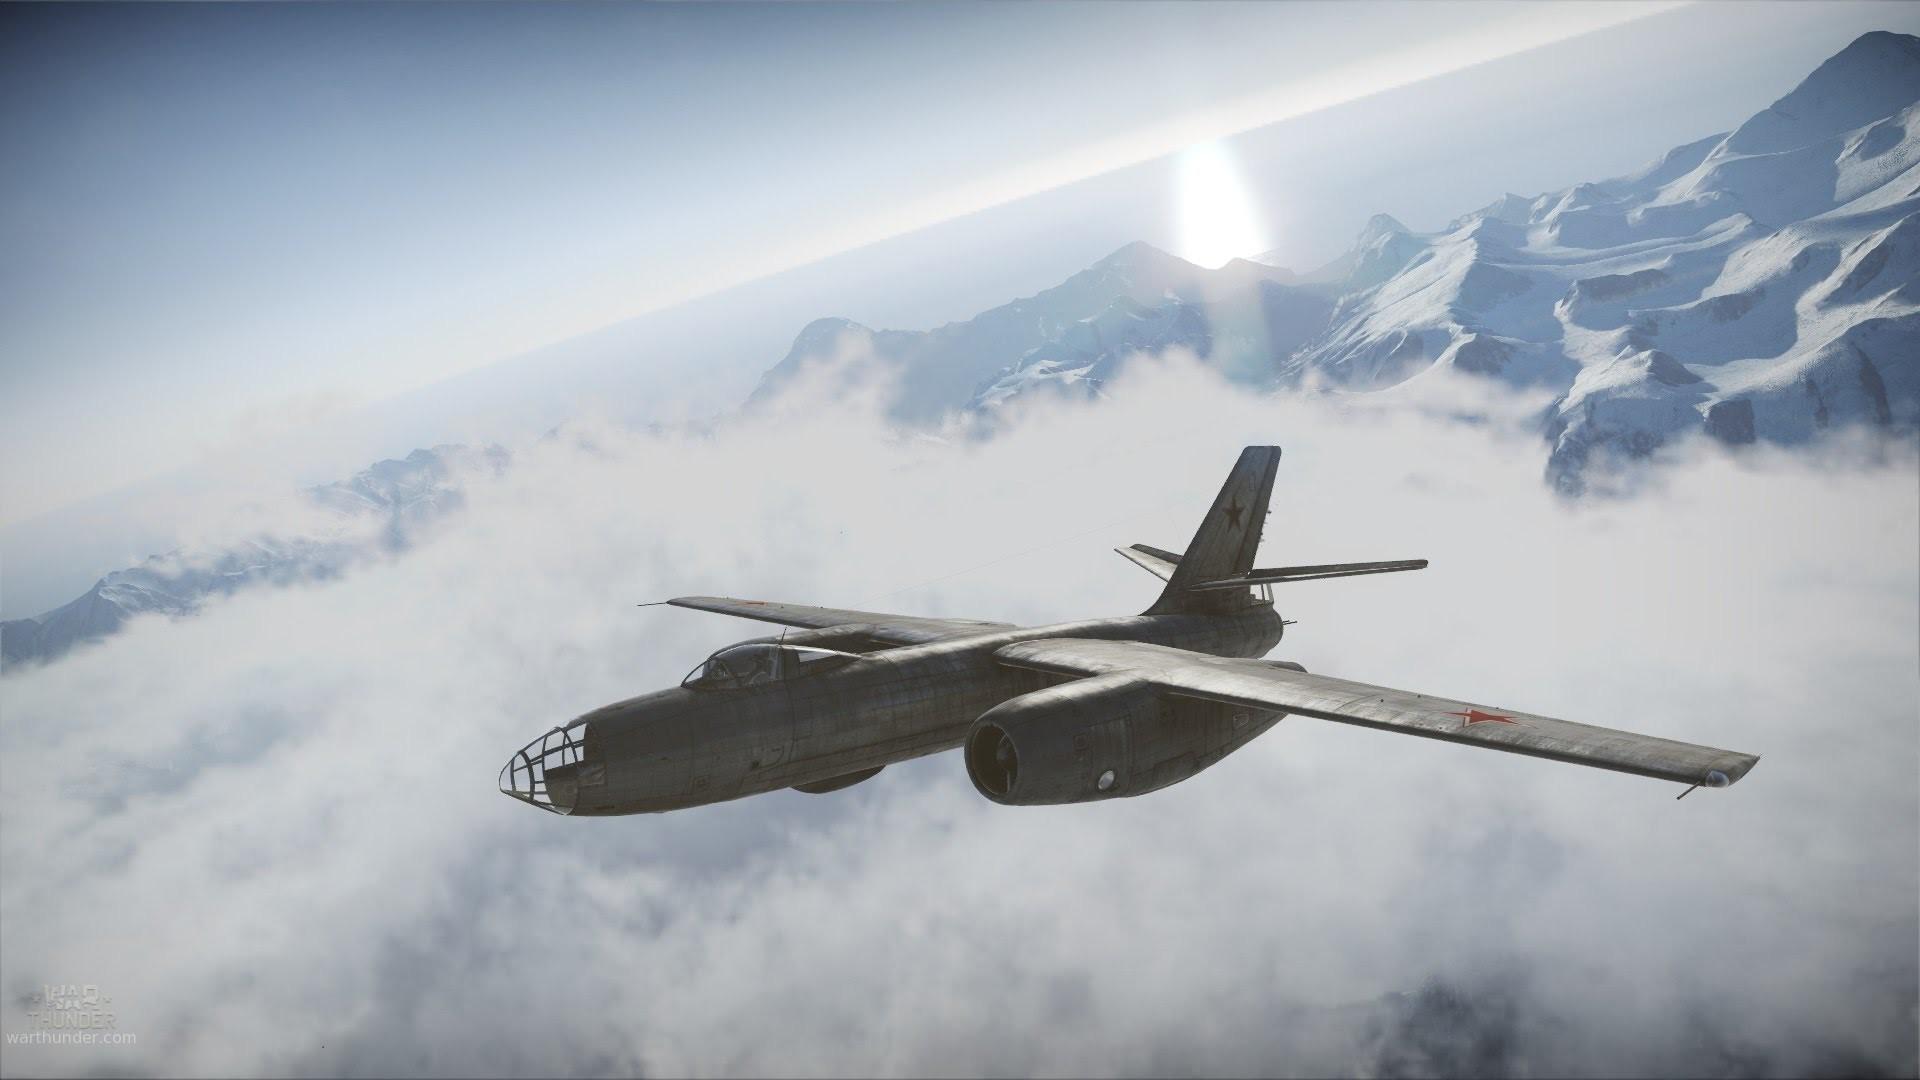 War Thunder IL-28 Jet Bomber vs B-17 Flying Fortress